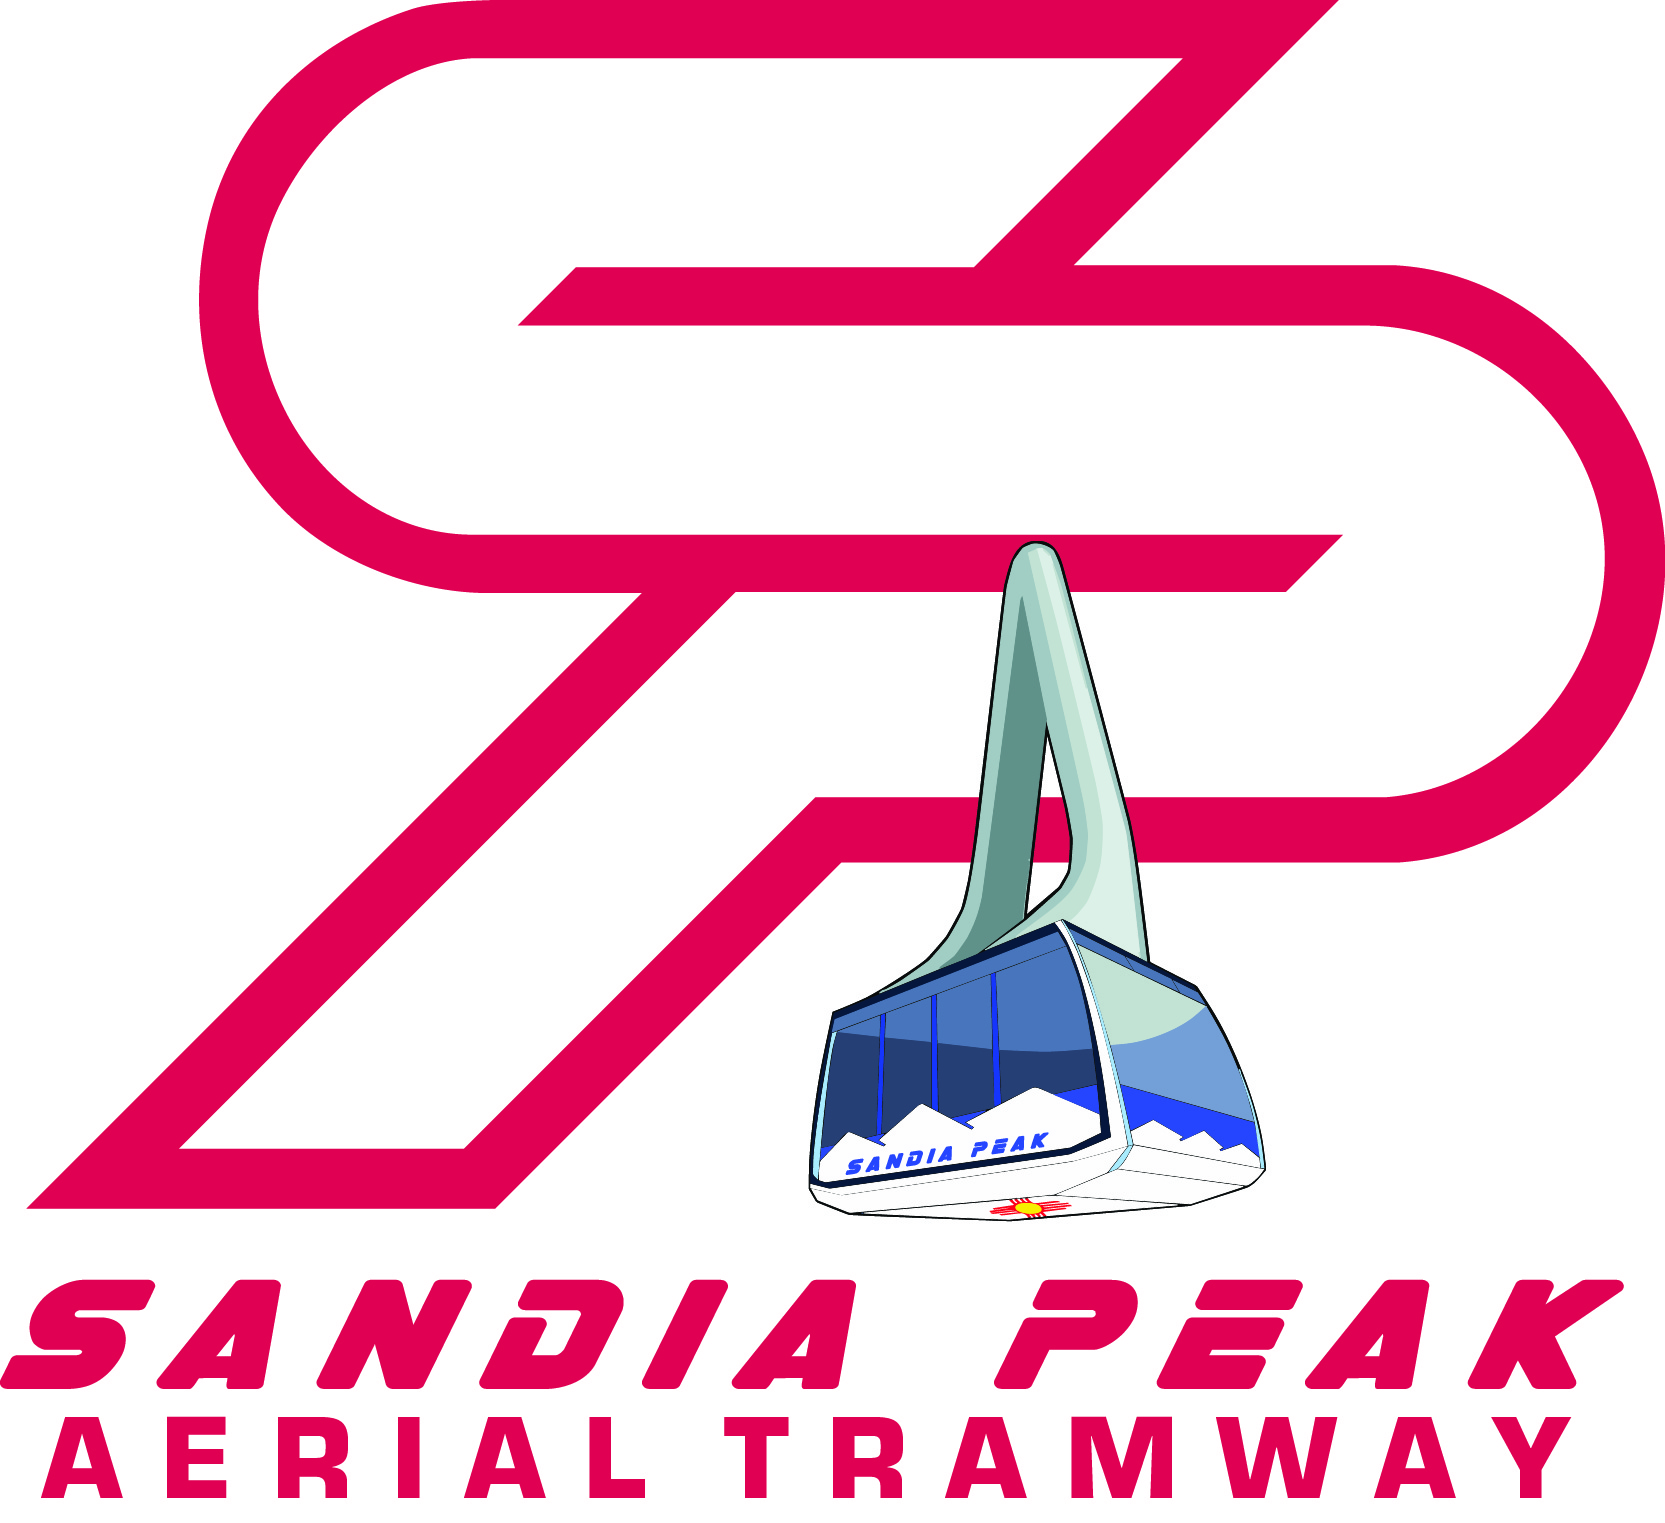 Sandia Peak Ski & Tramway